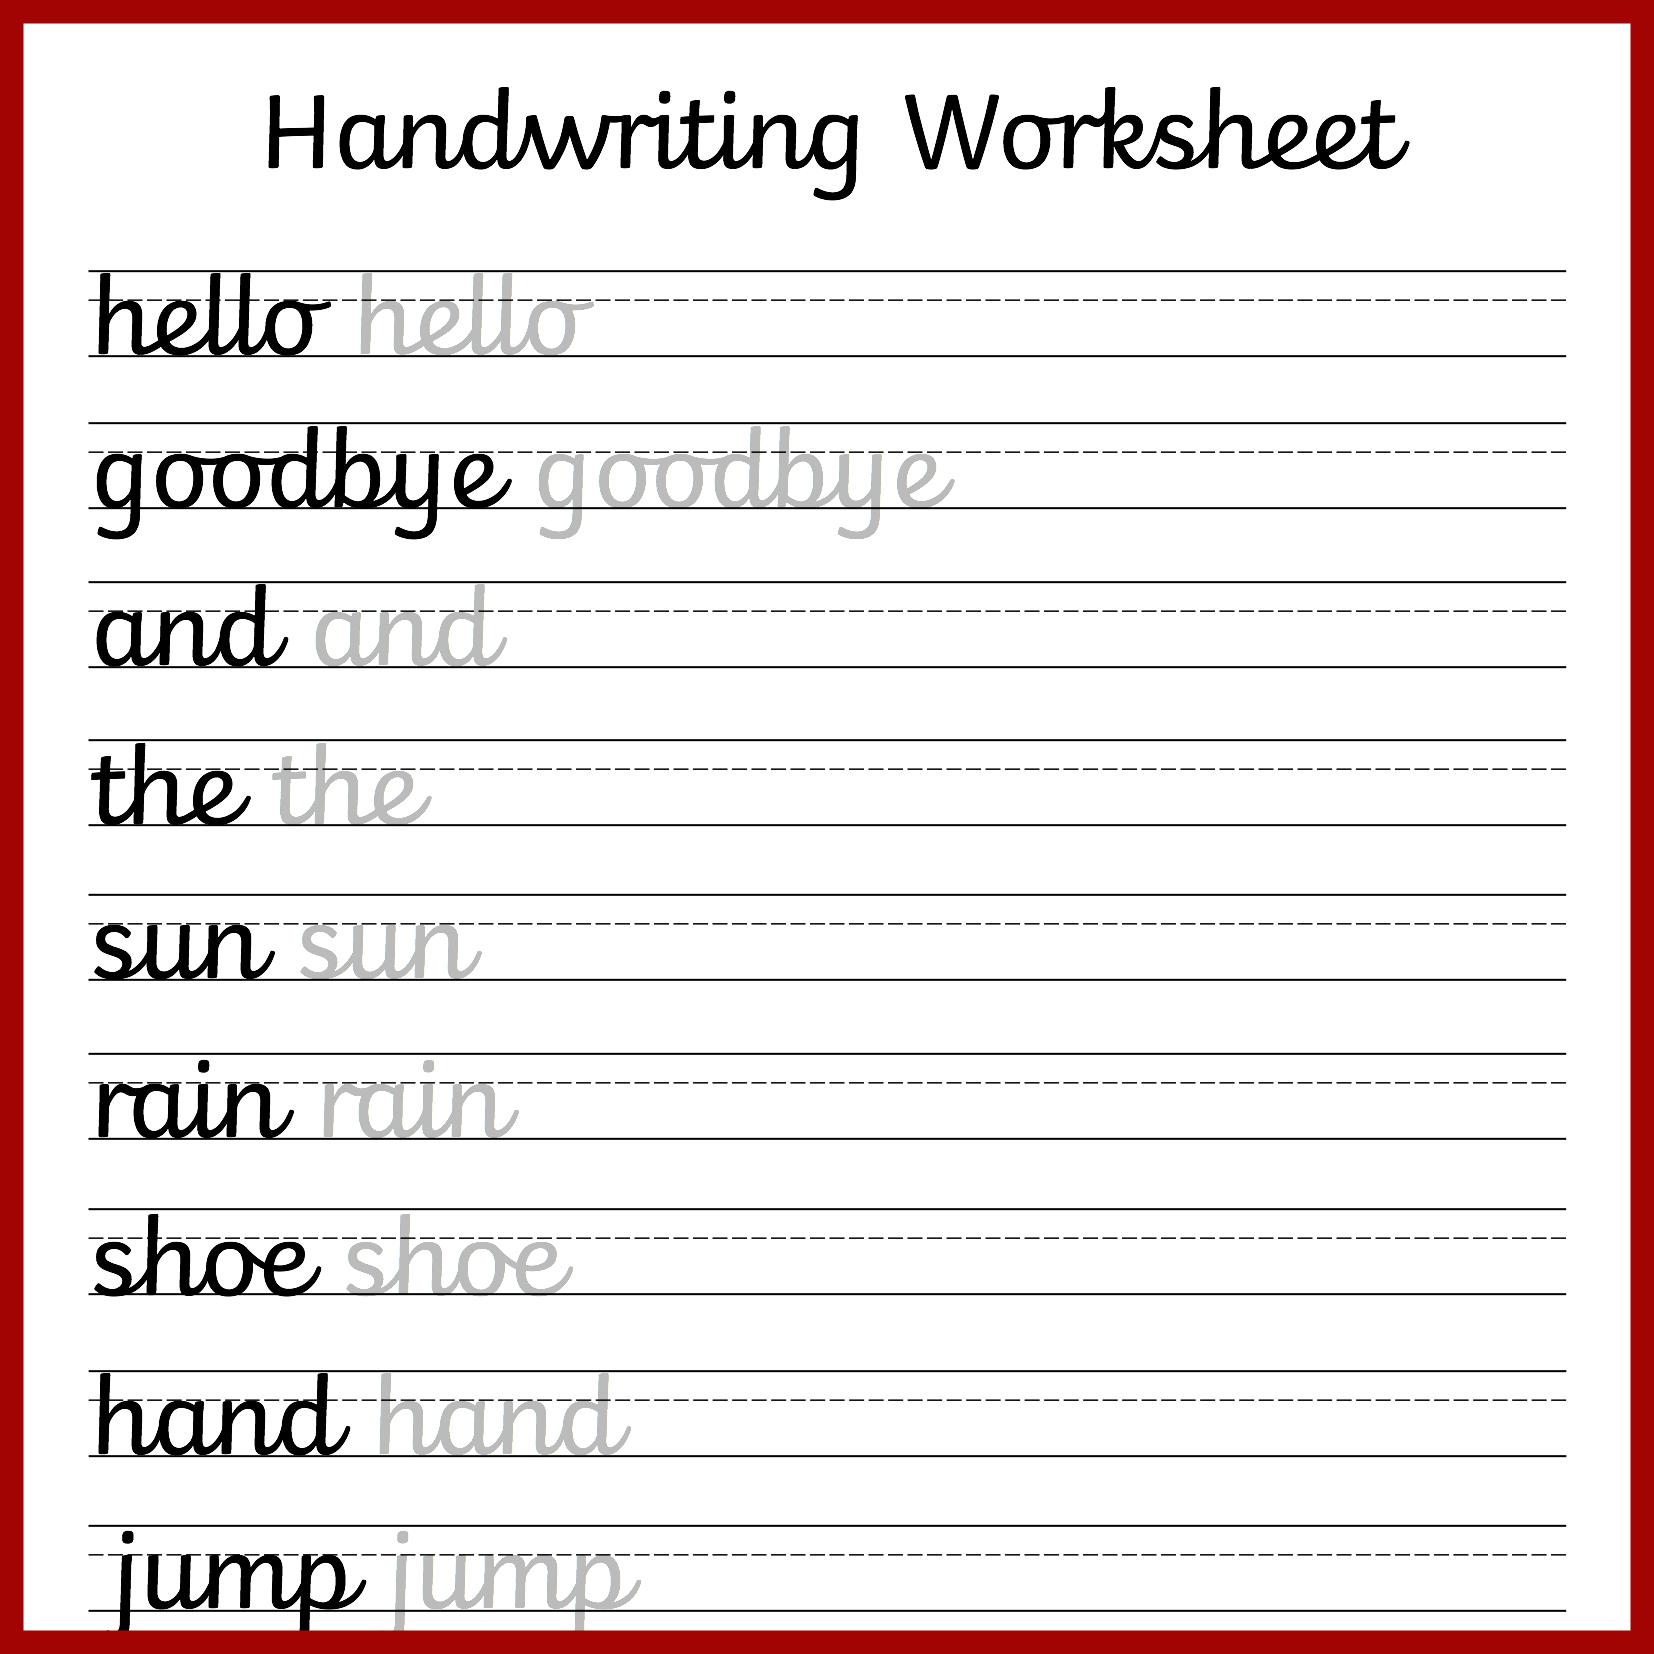 Cursive Handwriting Worksheets – Free Printable! ⋆ Mama Geek | Free Printable Cursive Handwriting Worksheets